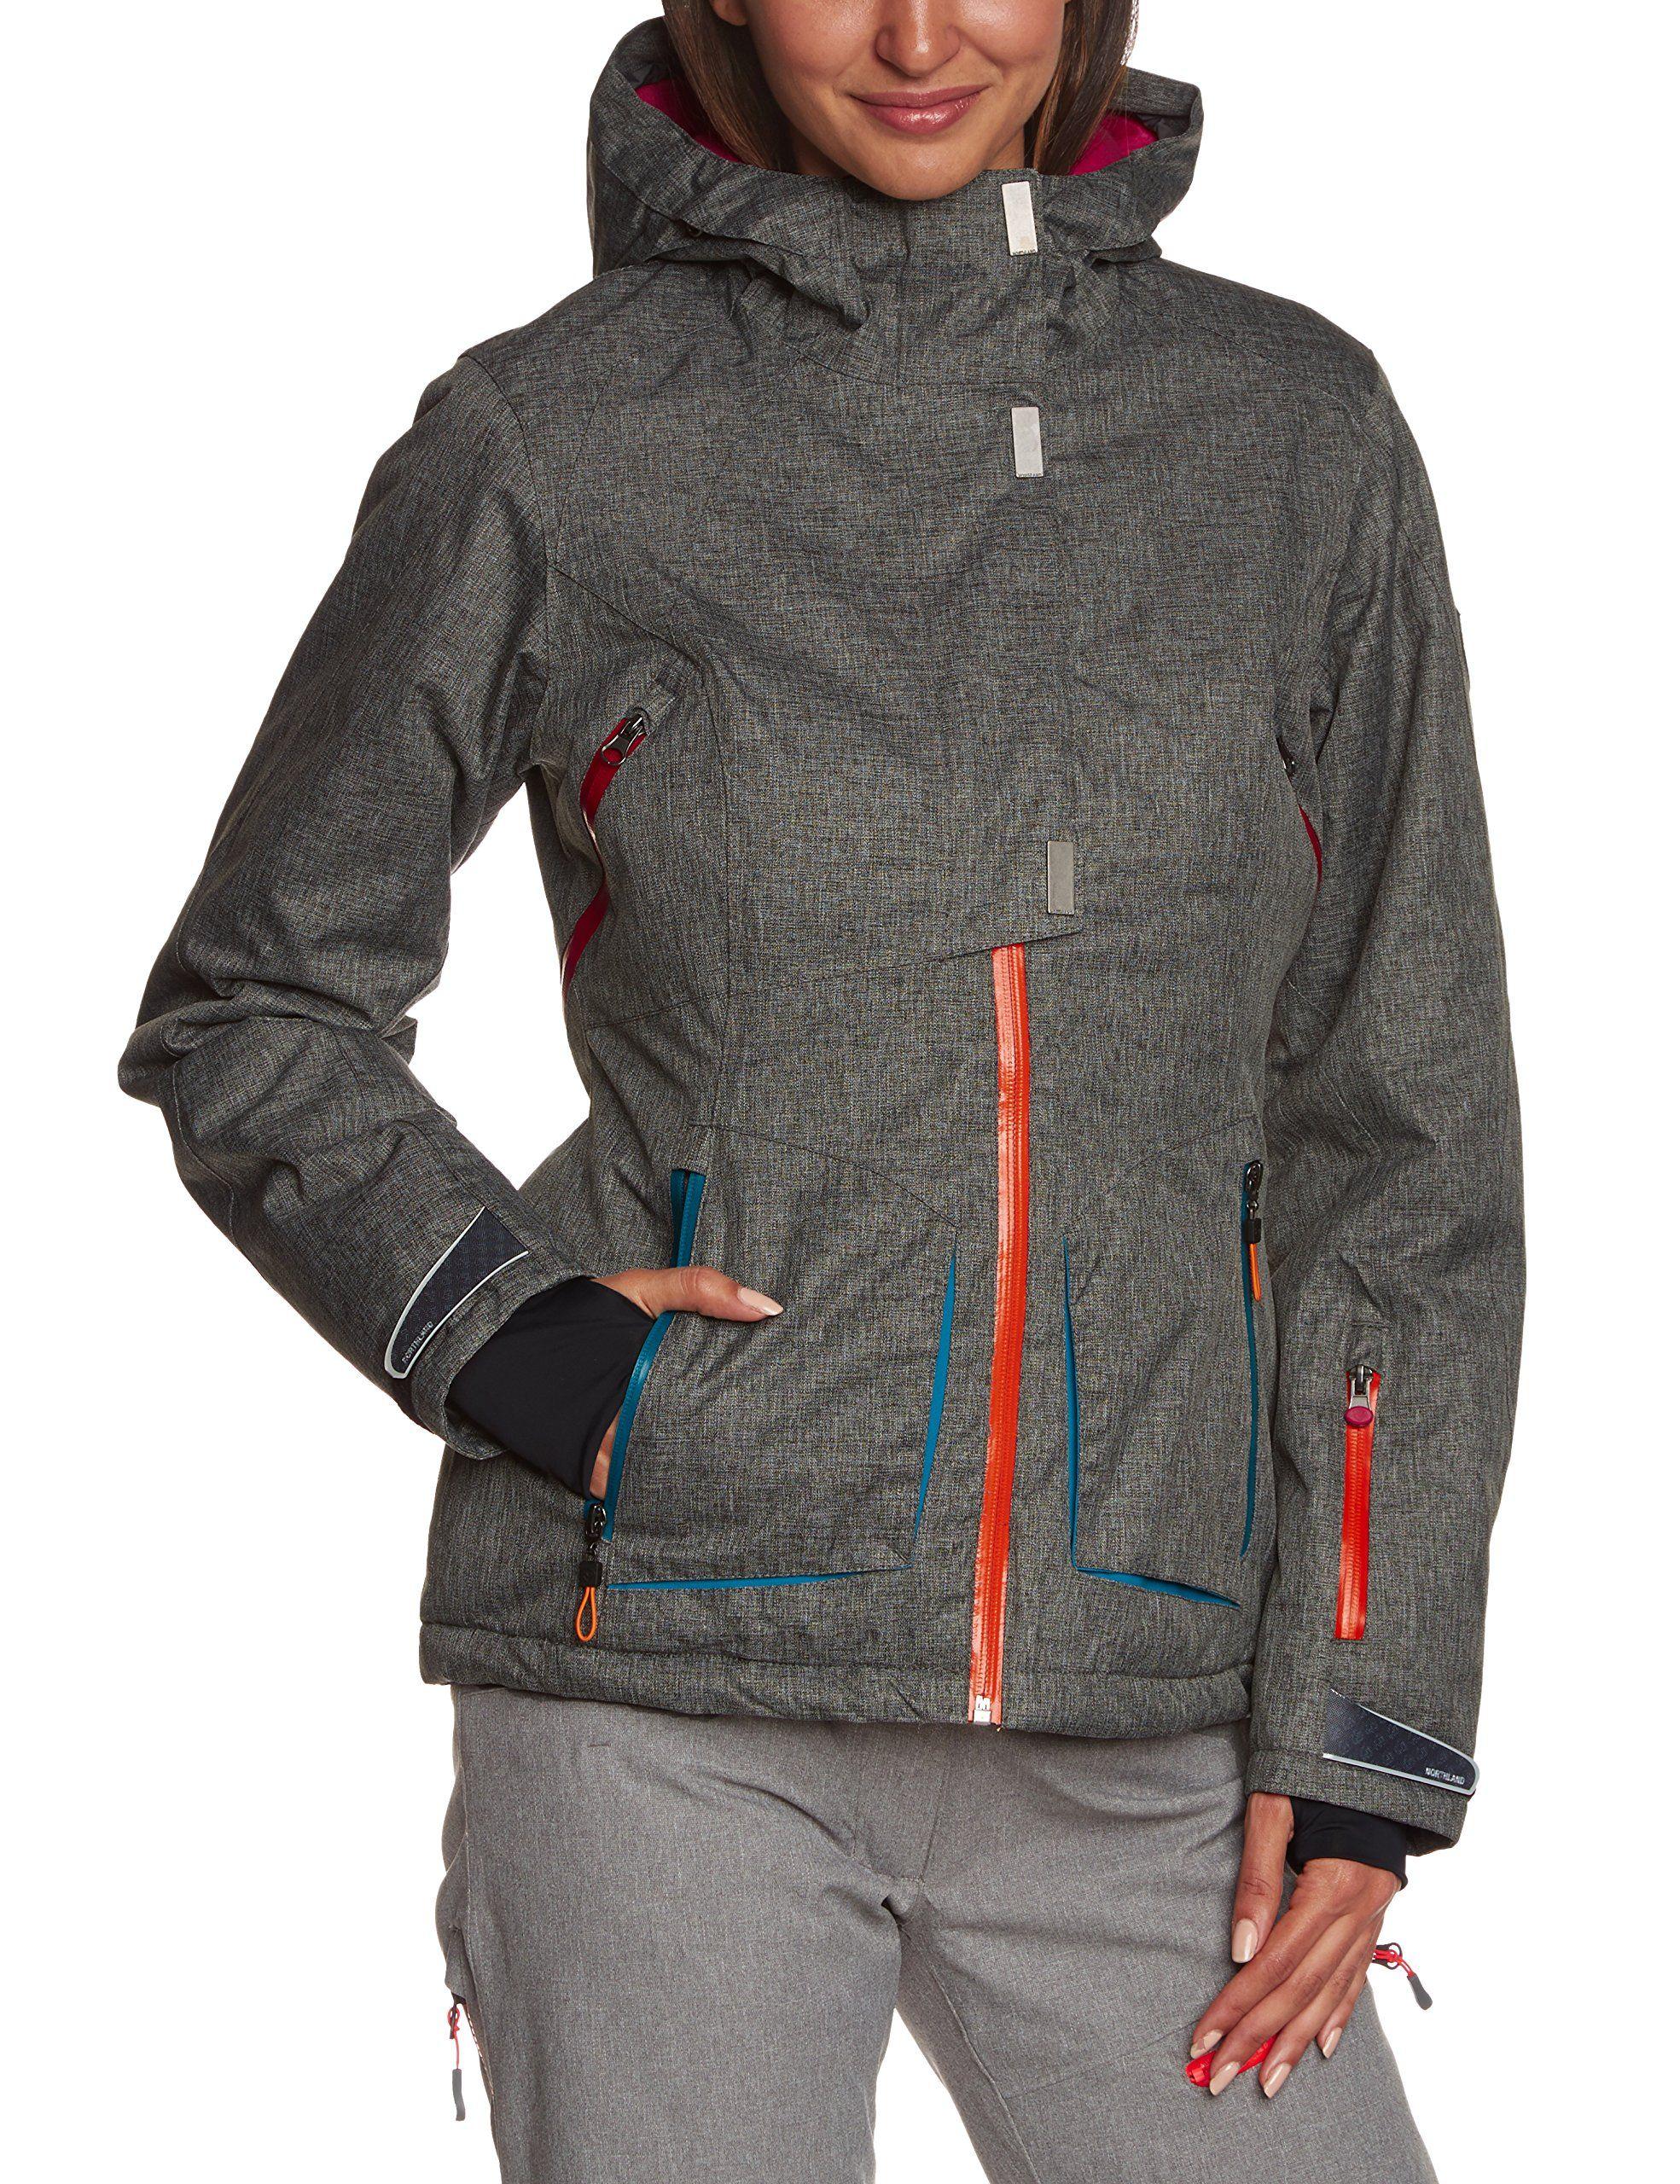 8e2271be8d38 Northland Professional 02-06601 - Women s Skiing Jacket  Amazon.co ...